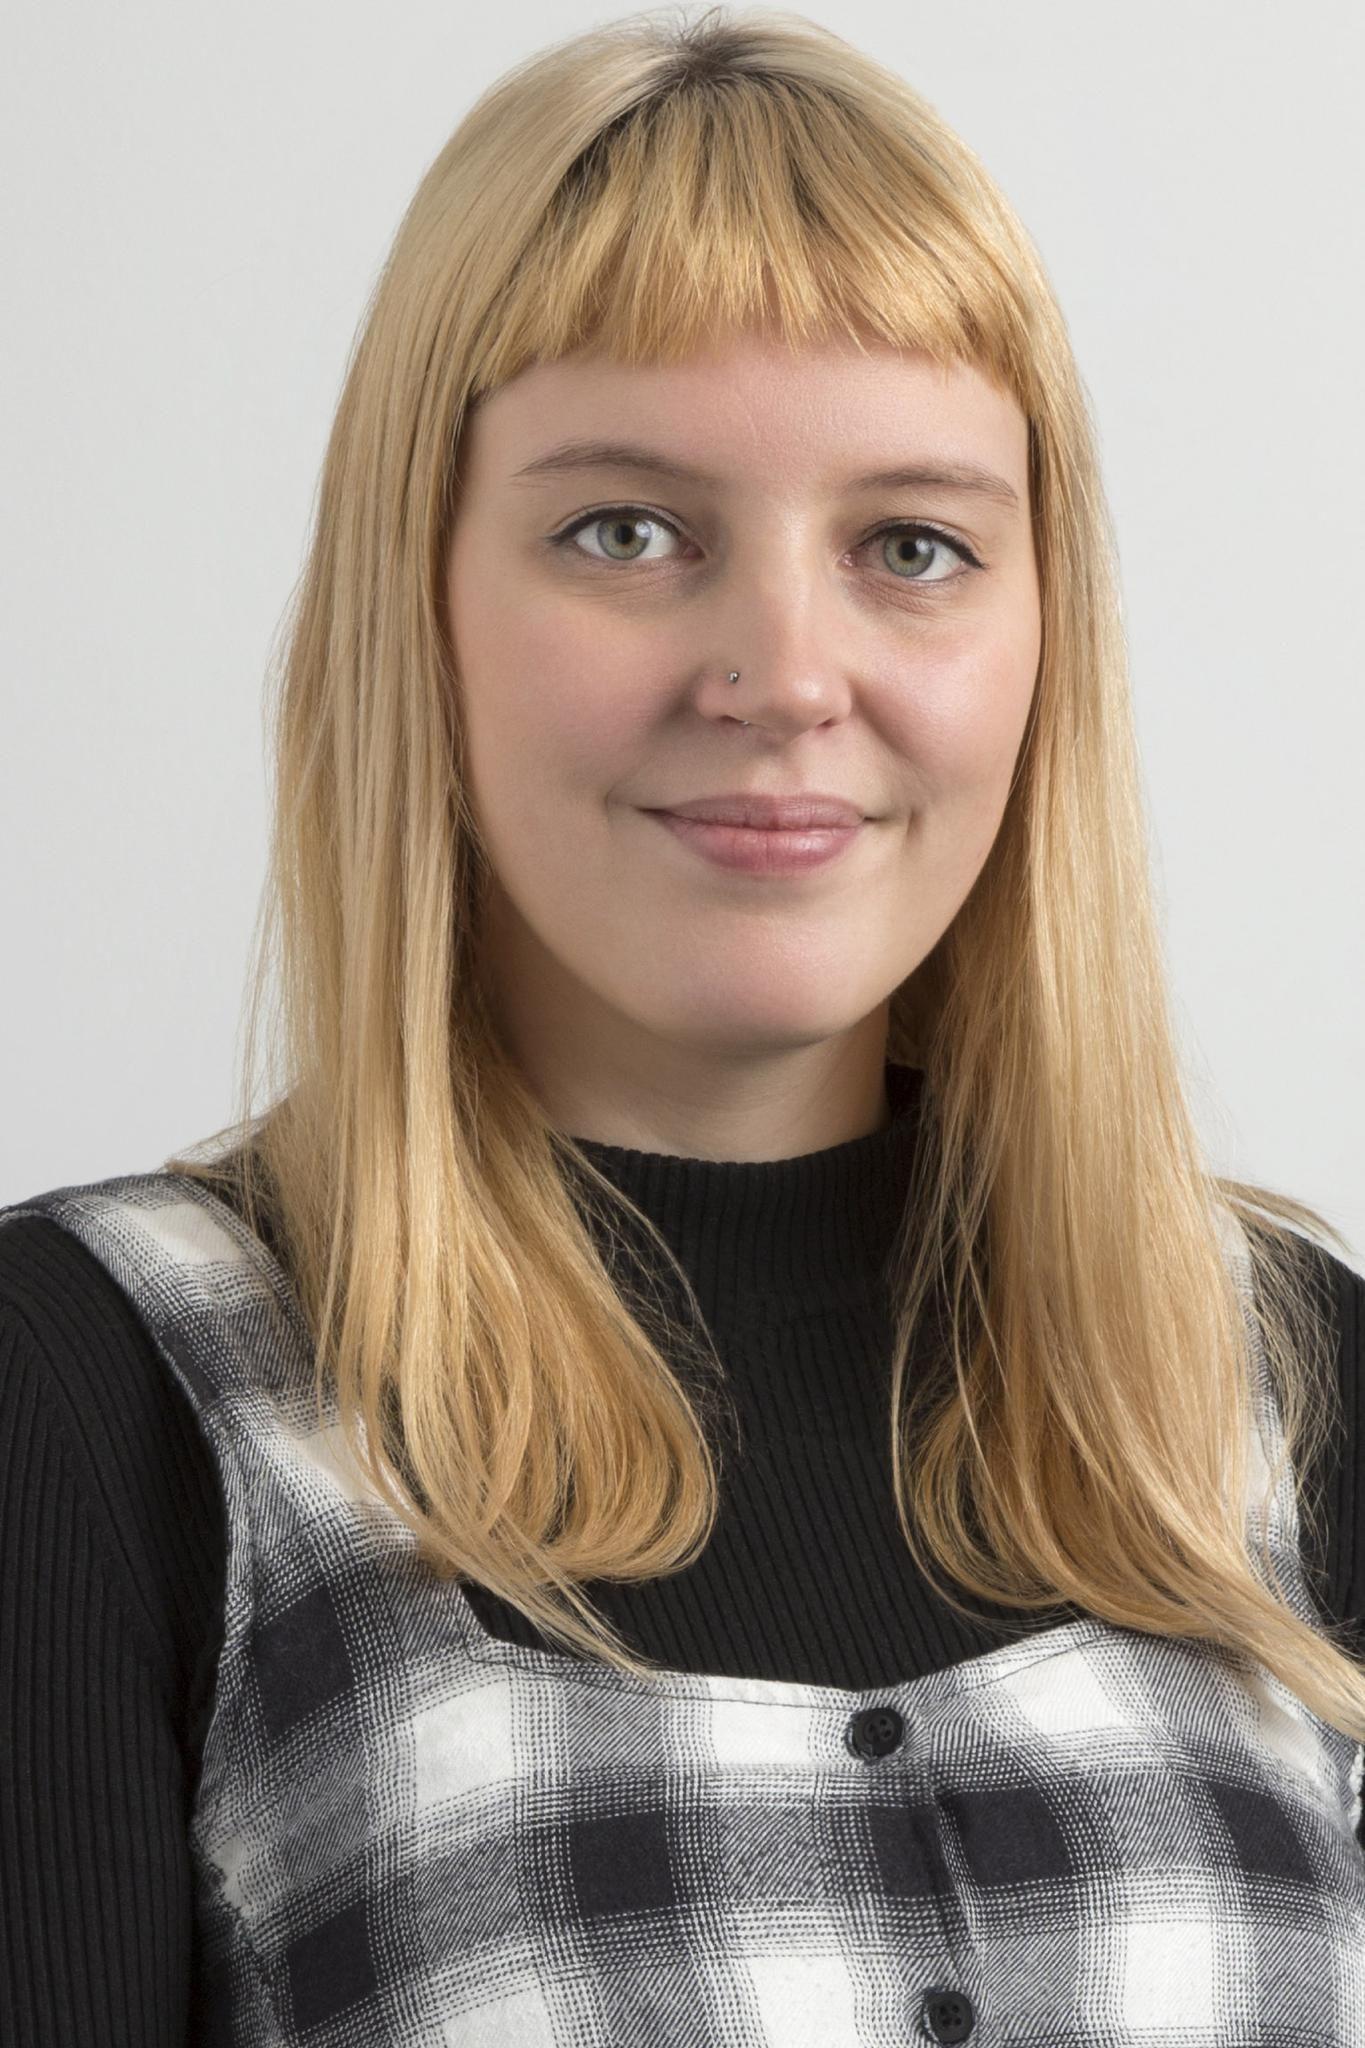 Christina Weaver